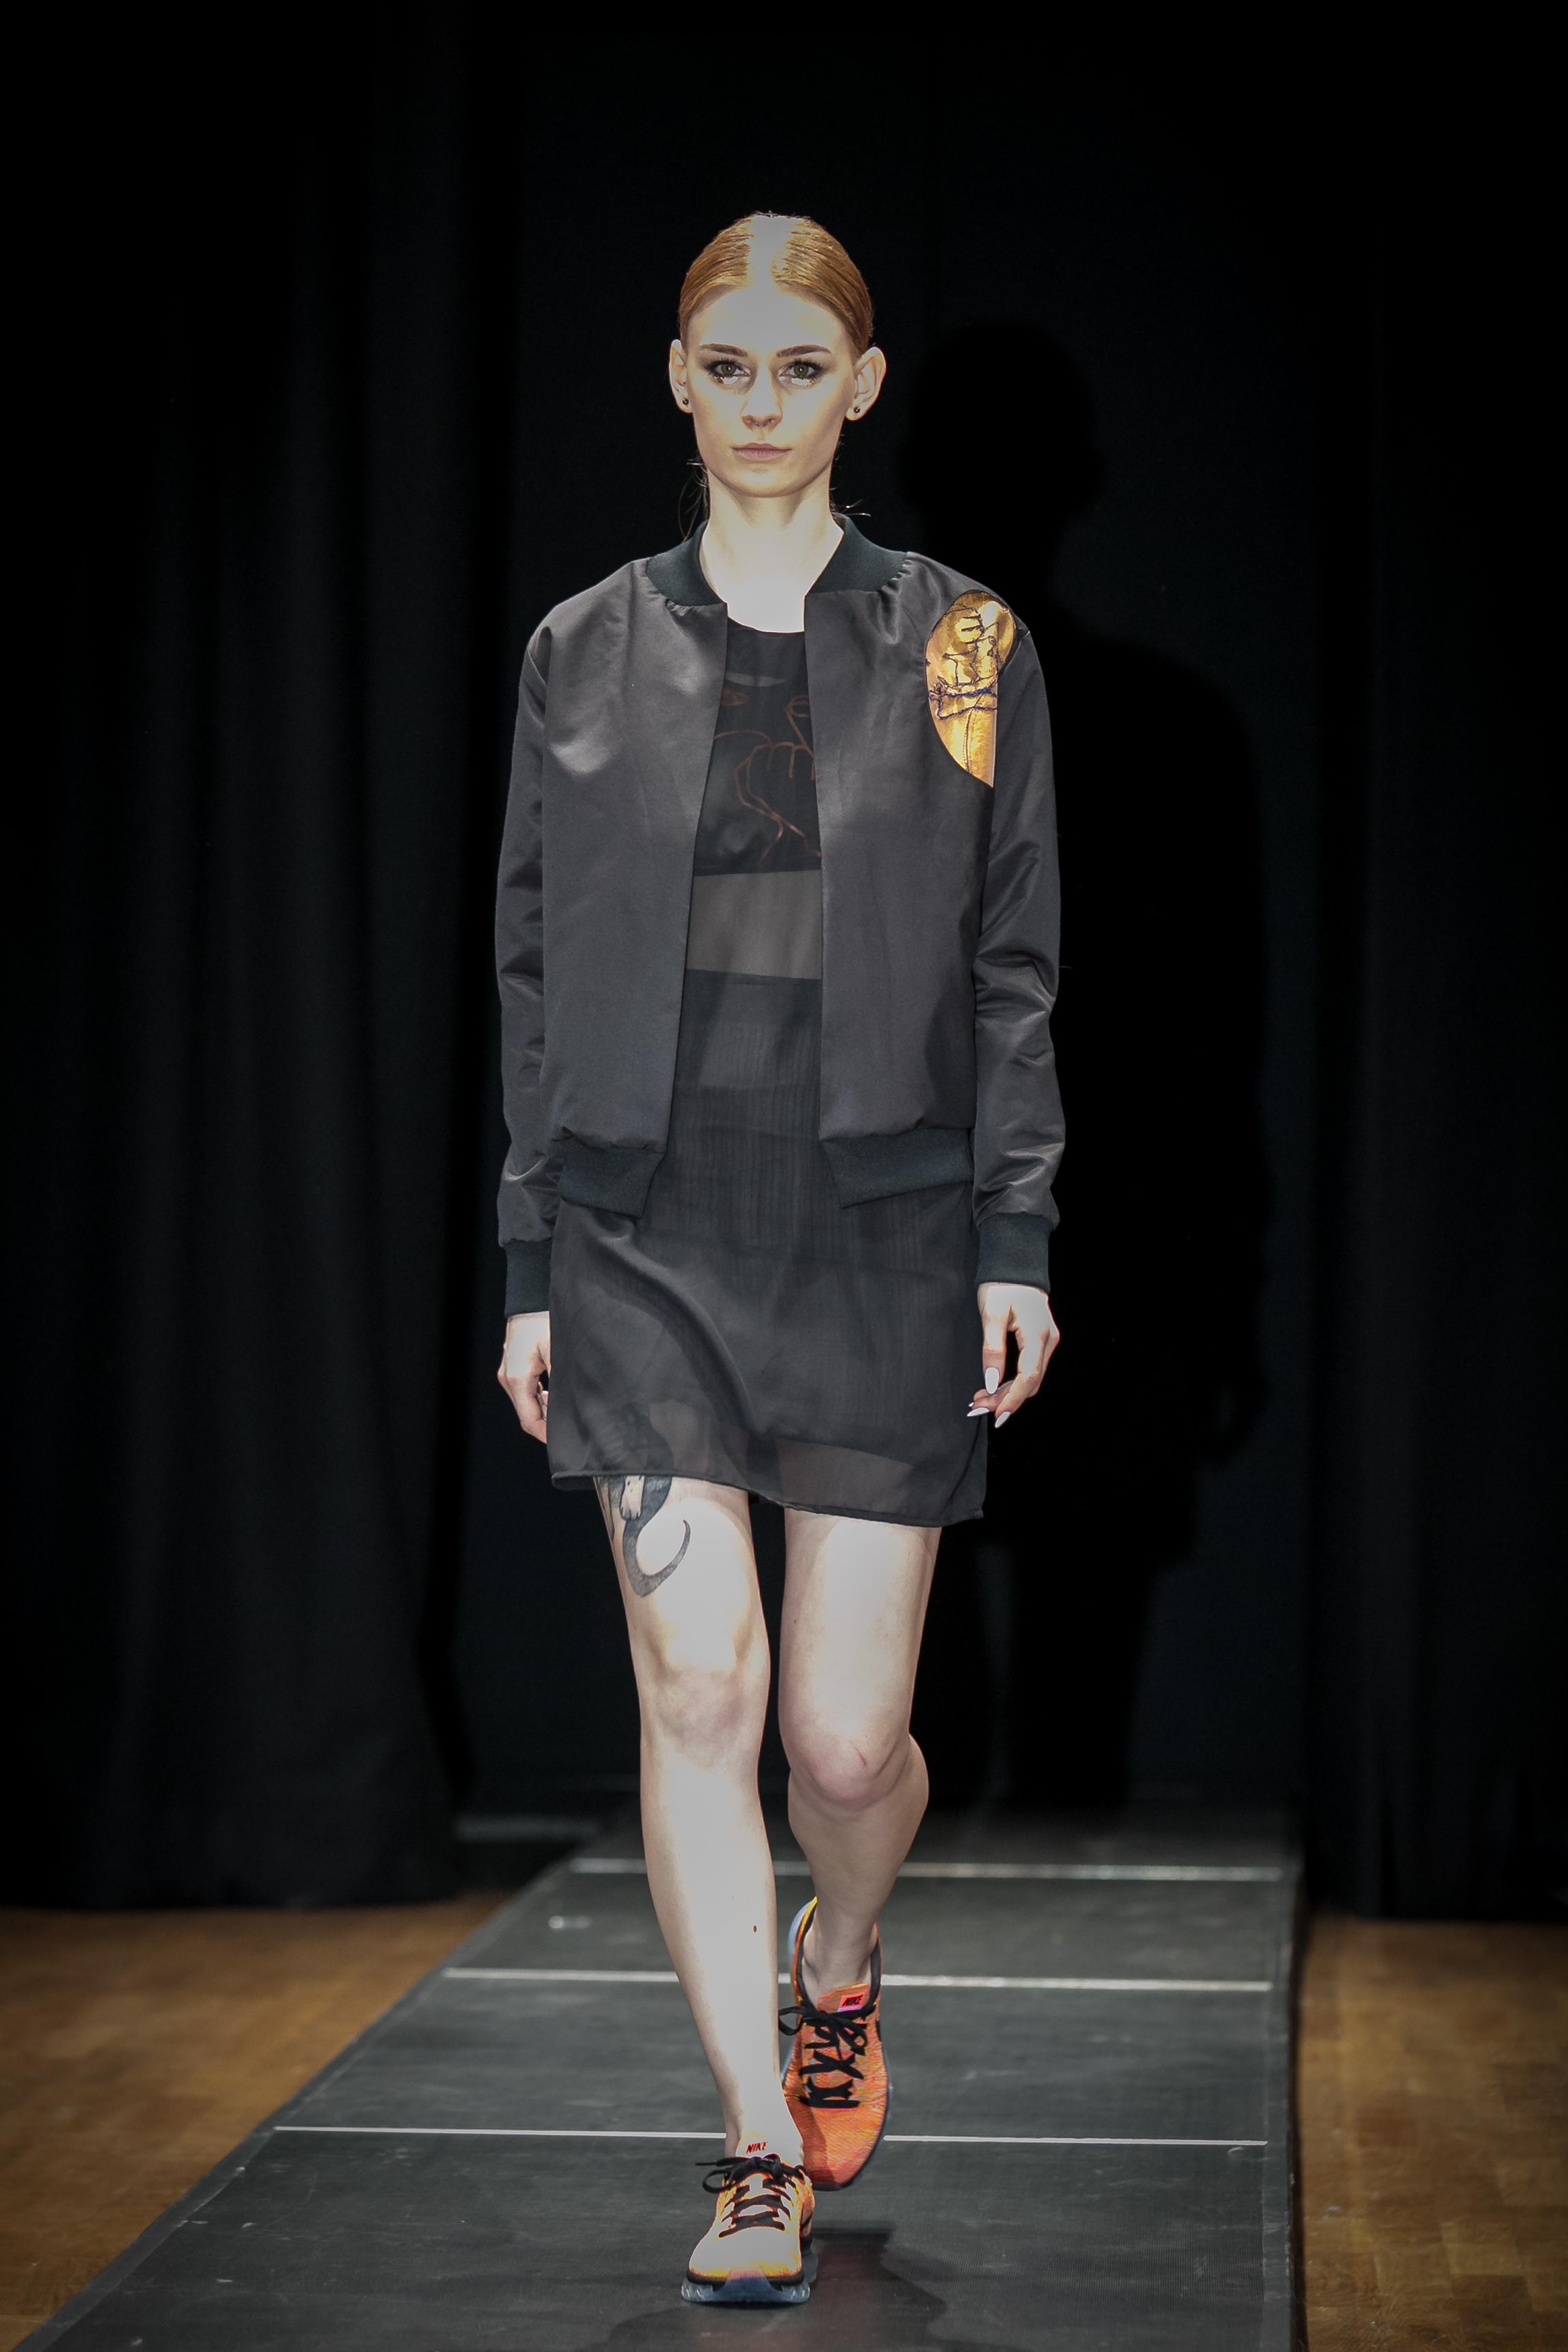 Kolekcja Hollow Oli Bajer Na Gali Cracow Fashion Awards Cracow Fashion Week